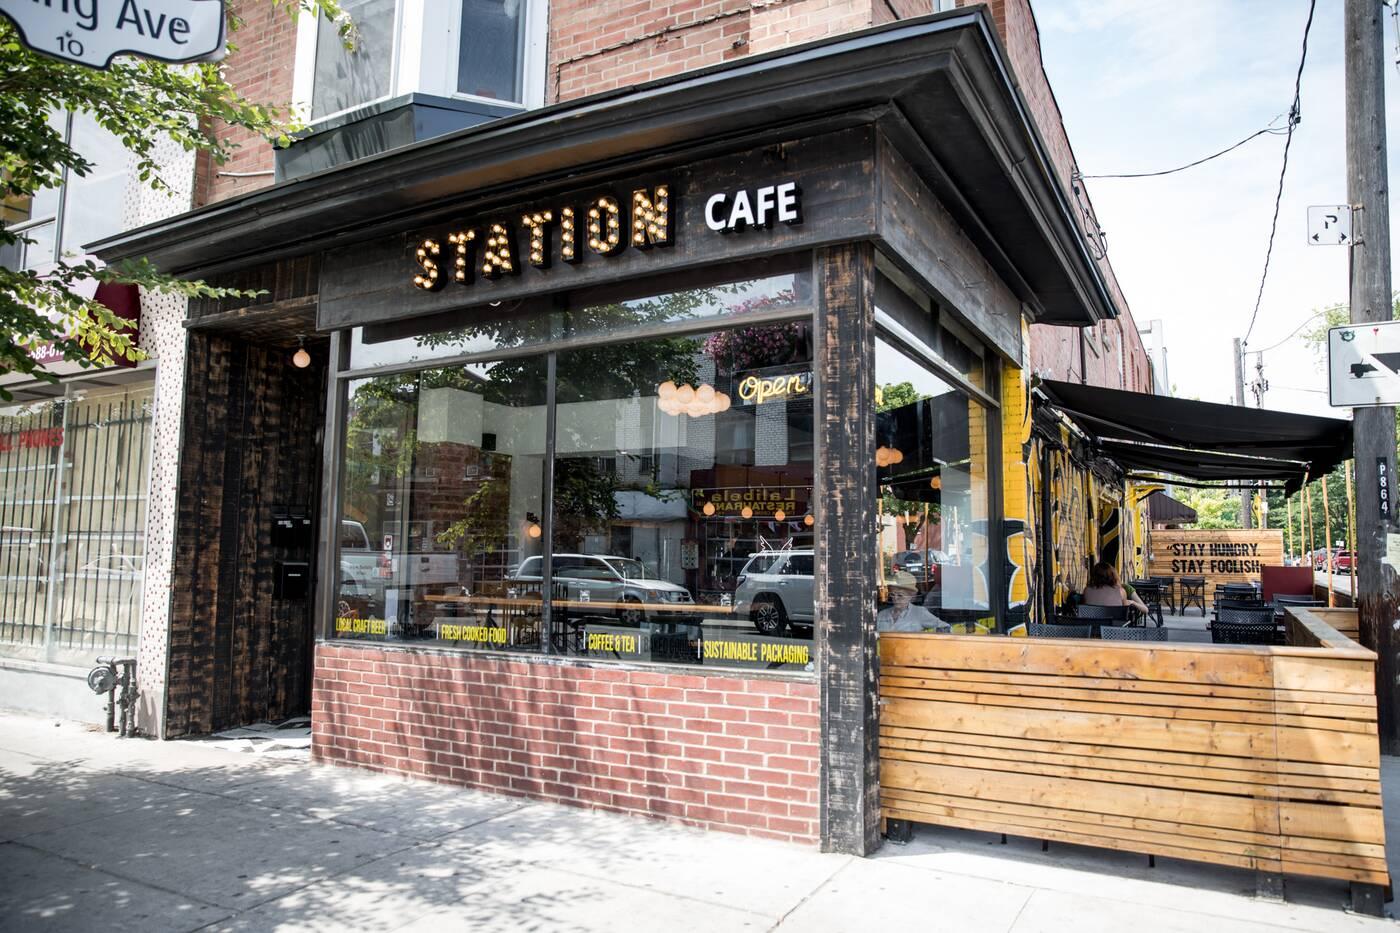 Station Cafe Toronto